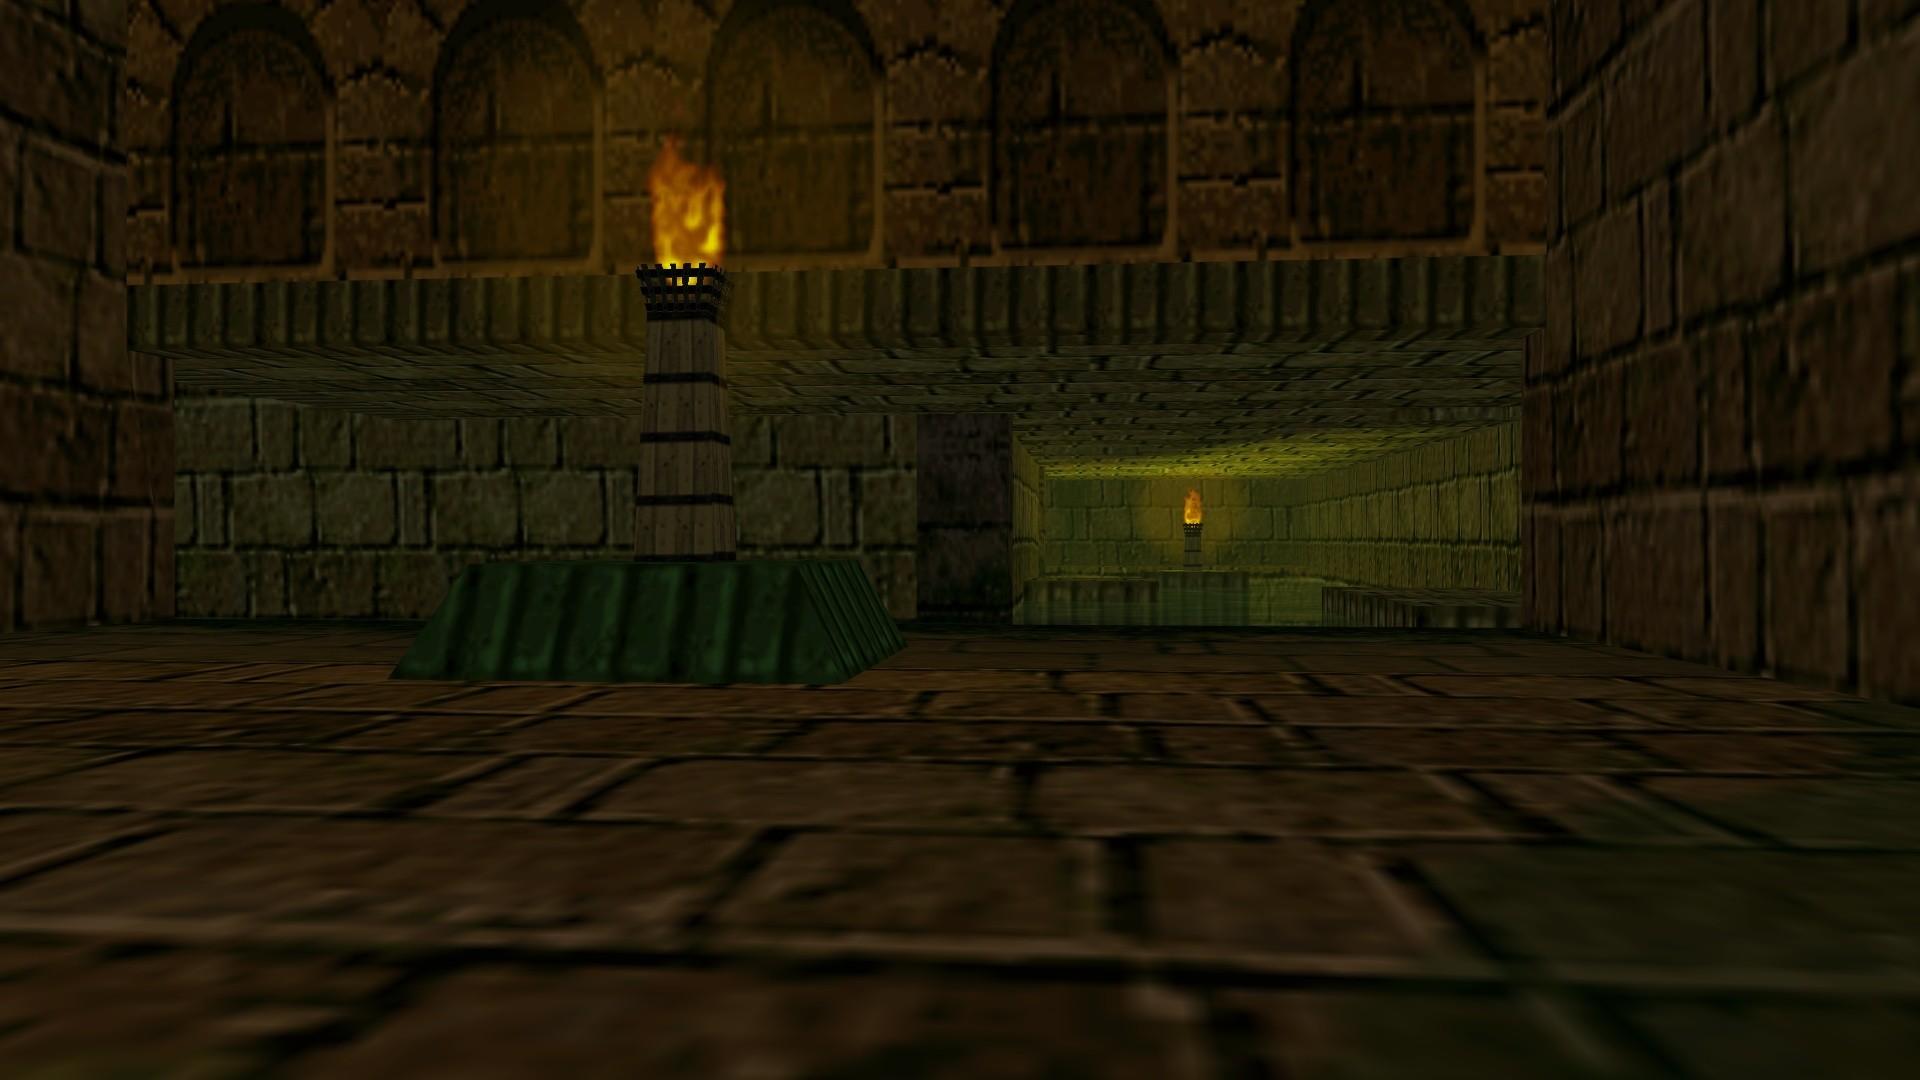 Zelda Majora's Mask Wallpaper